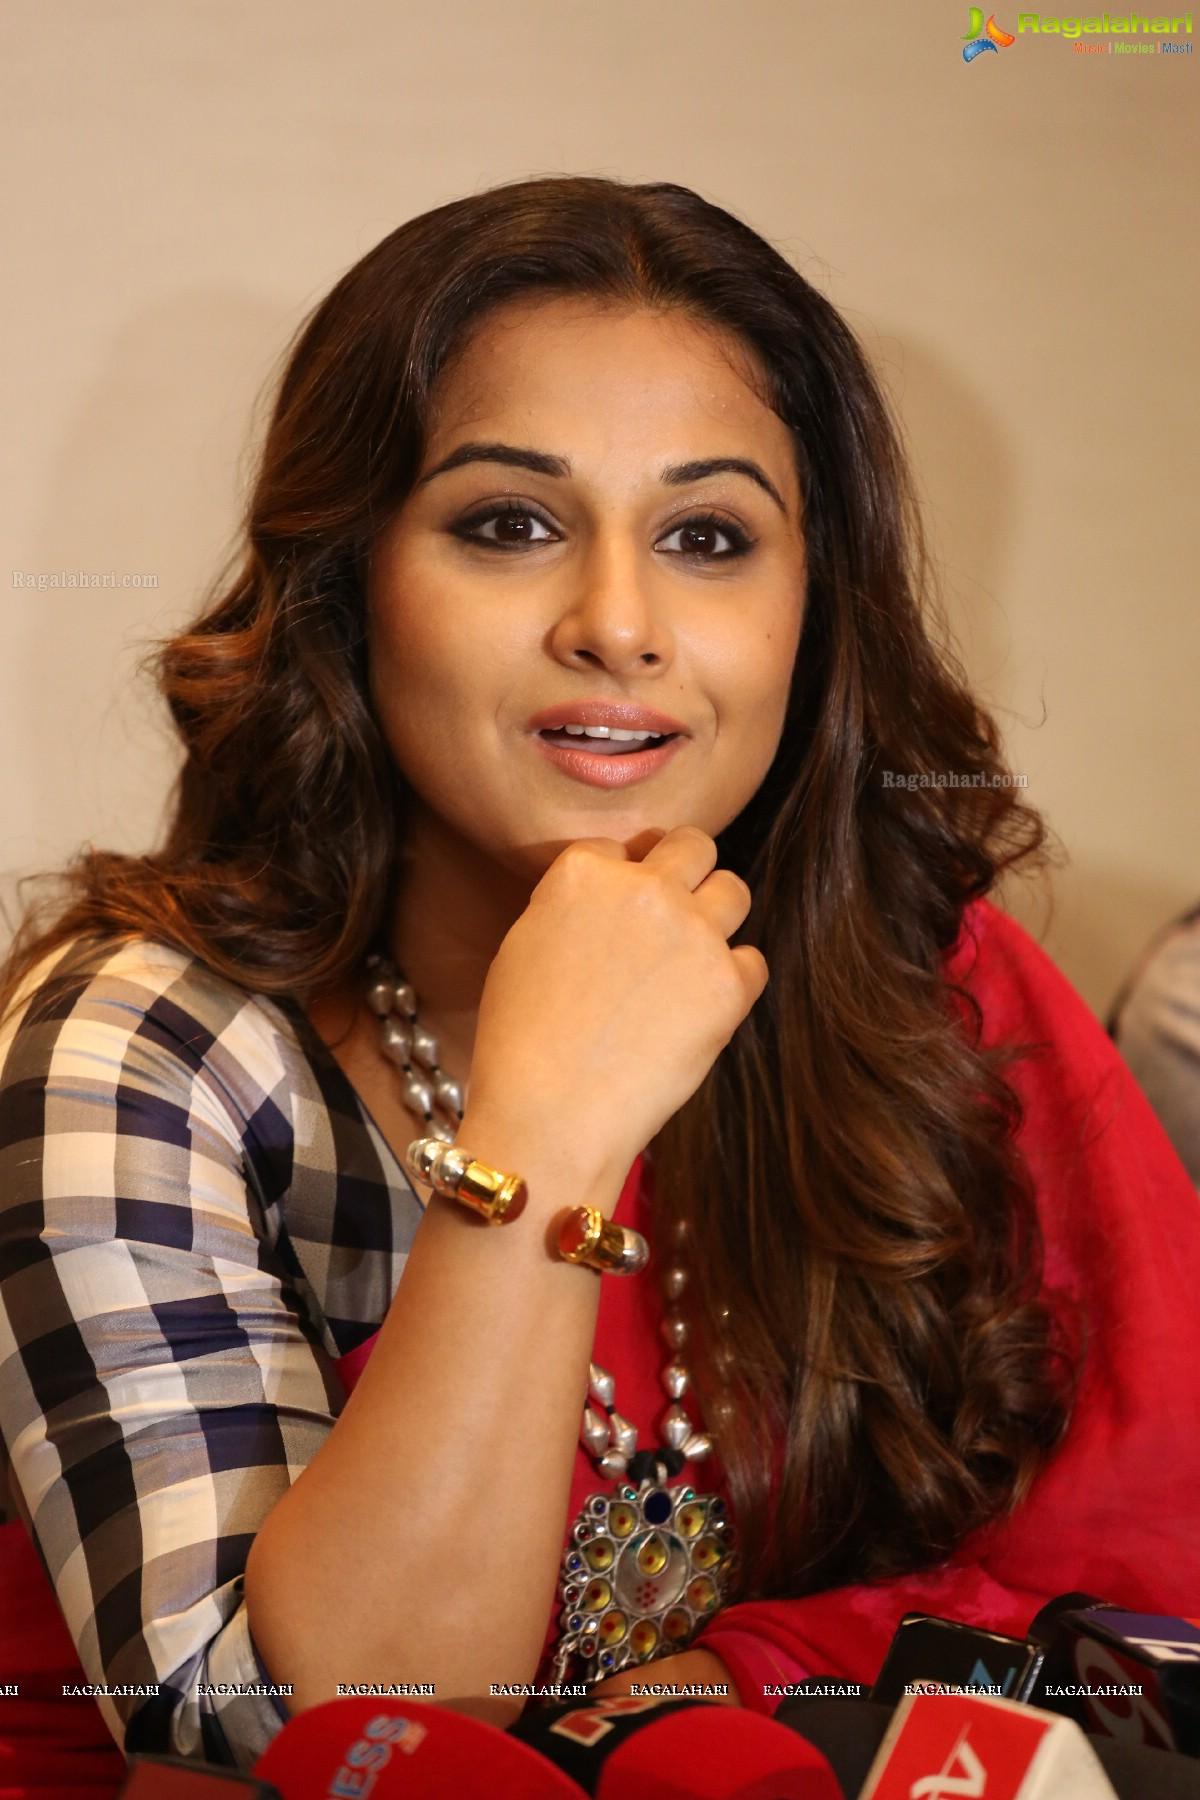 vidya balan image 59 | tollywood heroines stills,telugu movie